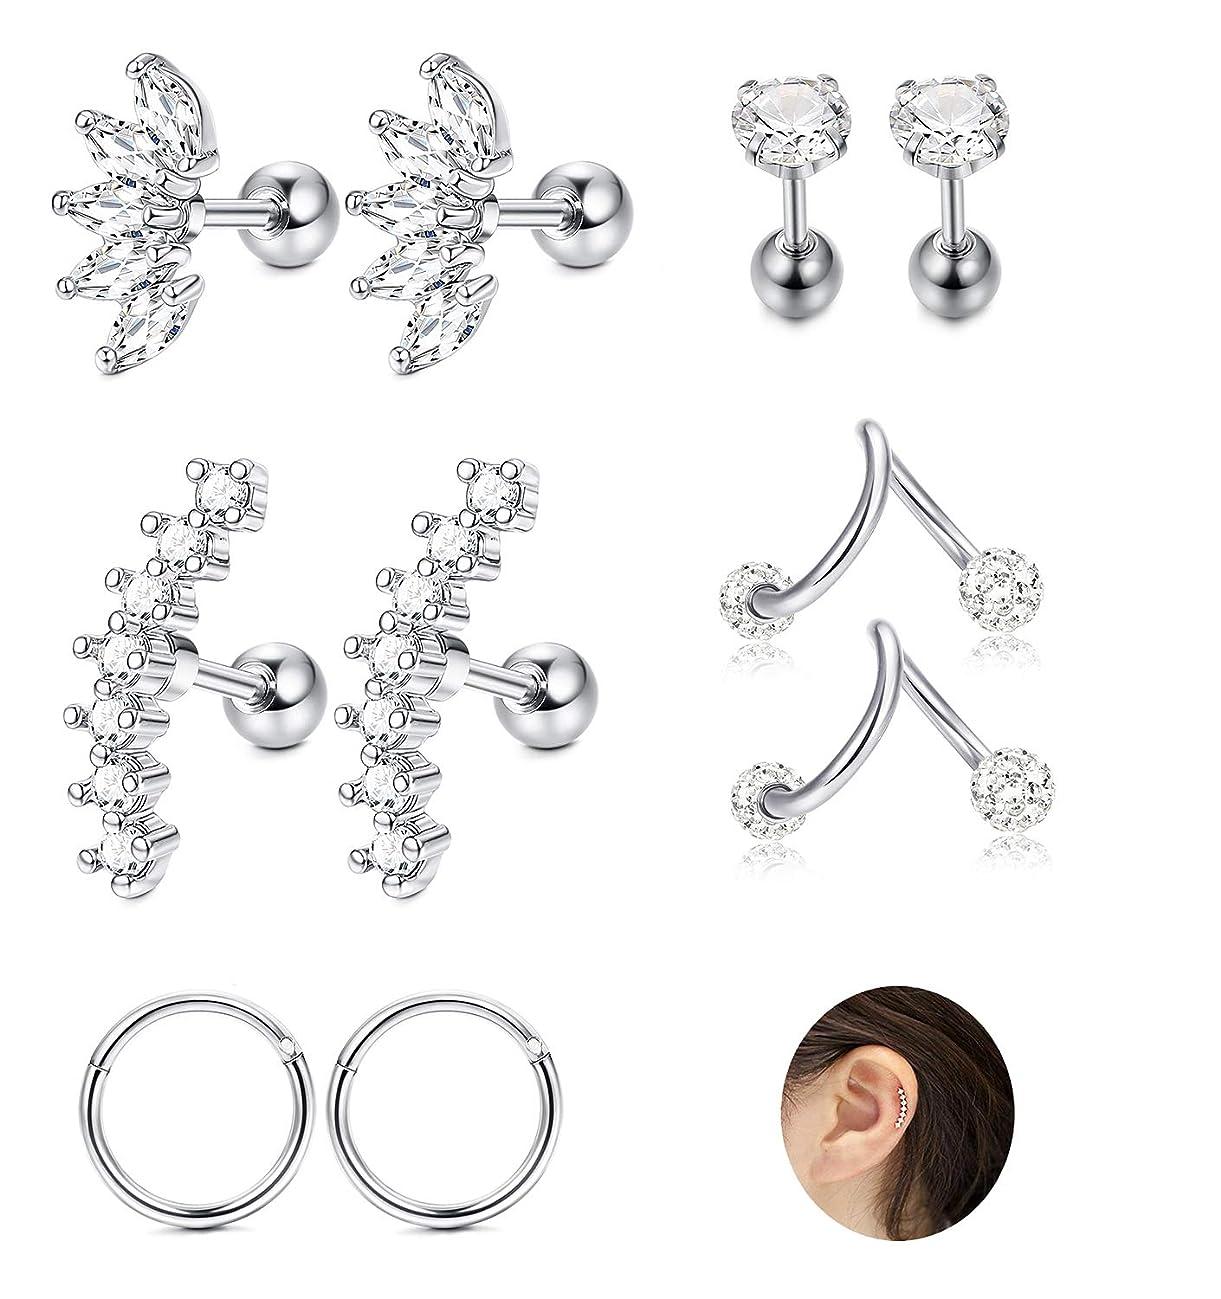 JOERICA 3 Pairs Stainless Steel Silver Ear Cartilage Earrings for Women Girls Tragus Helix Earring Cute Conch Flat Back Piercing Jewelry 16G